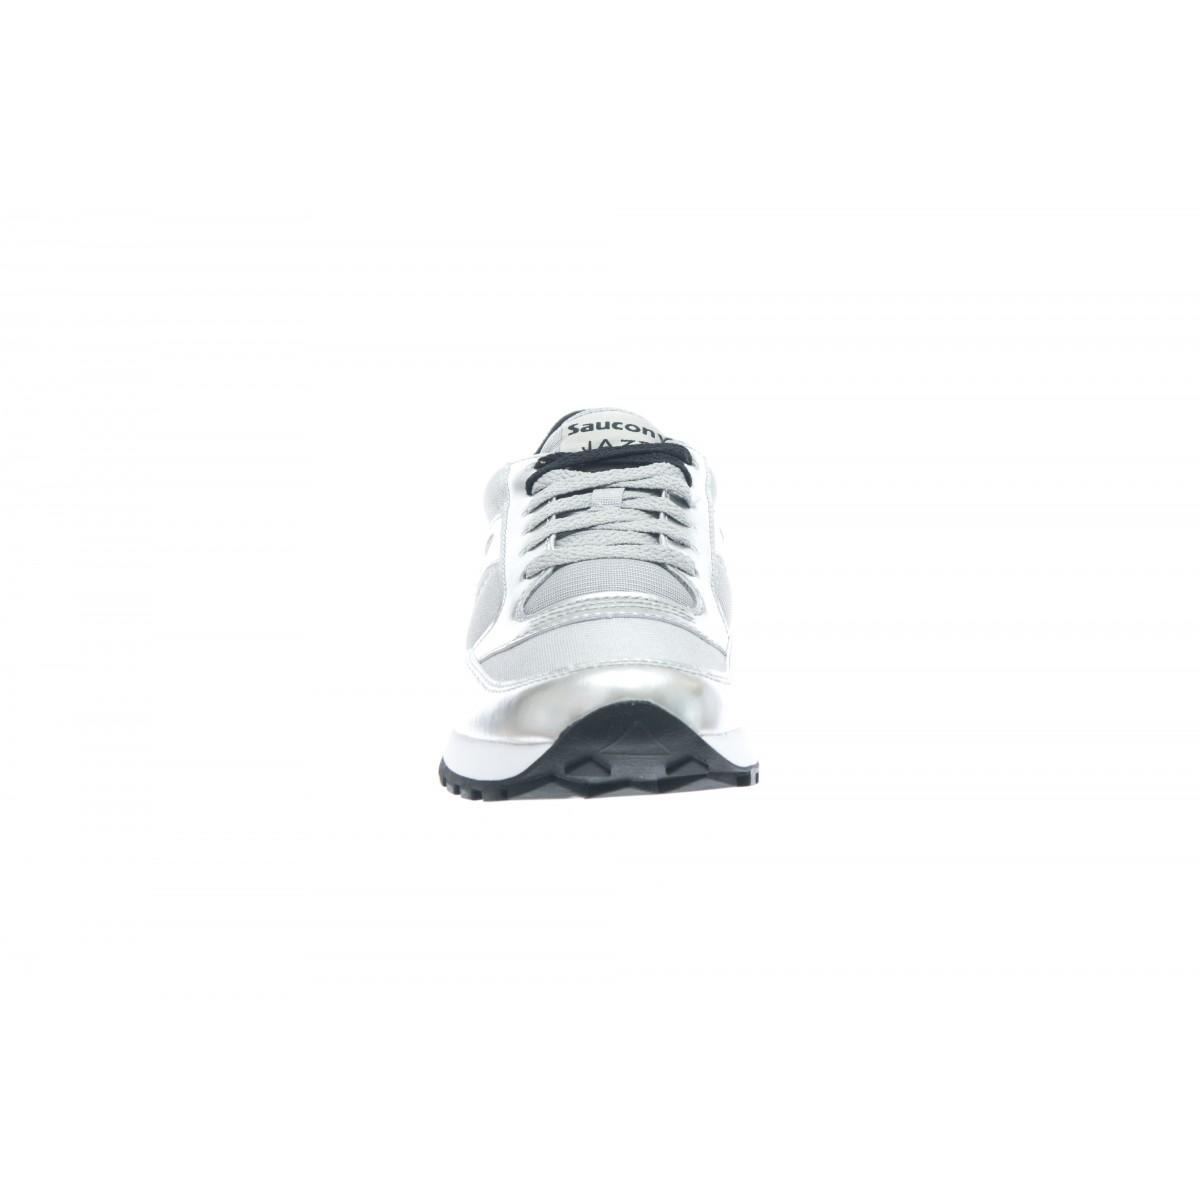 Scarpa - 1044 461 silver frange